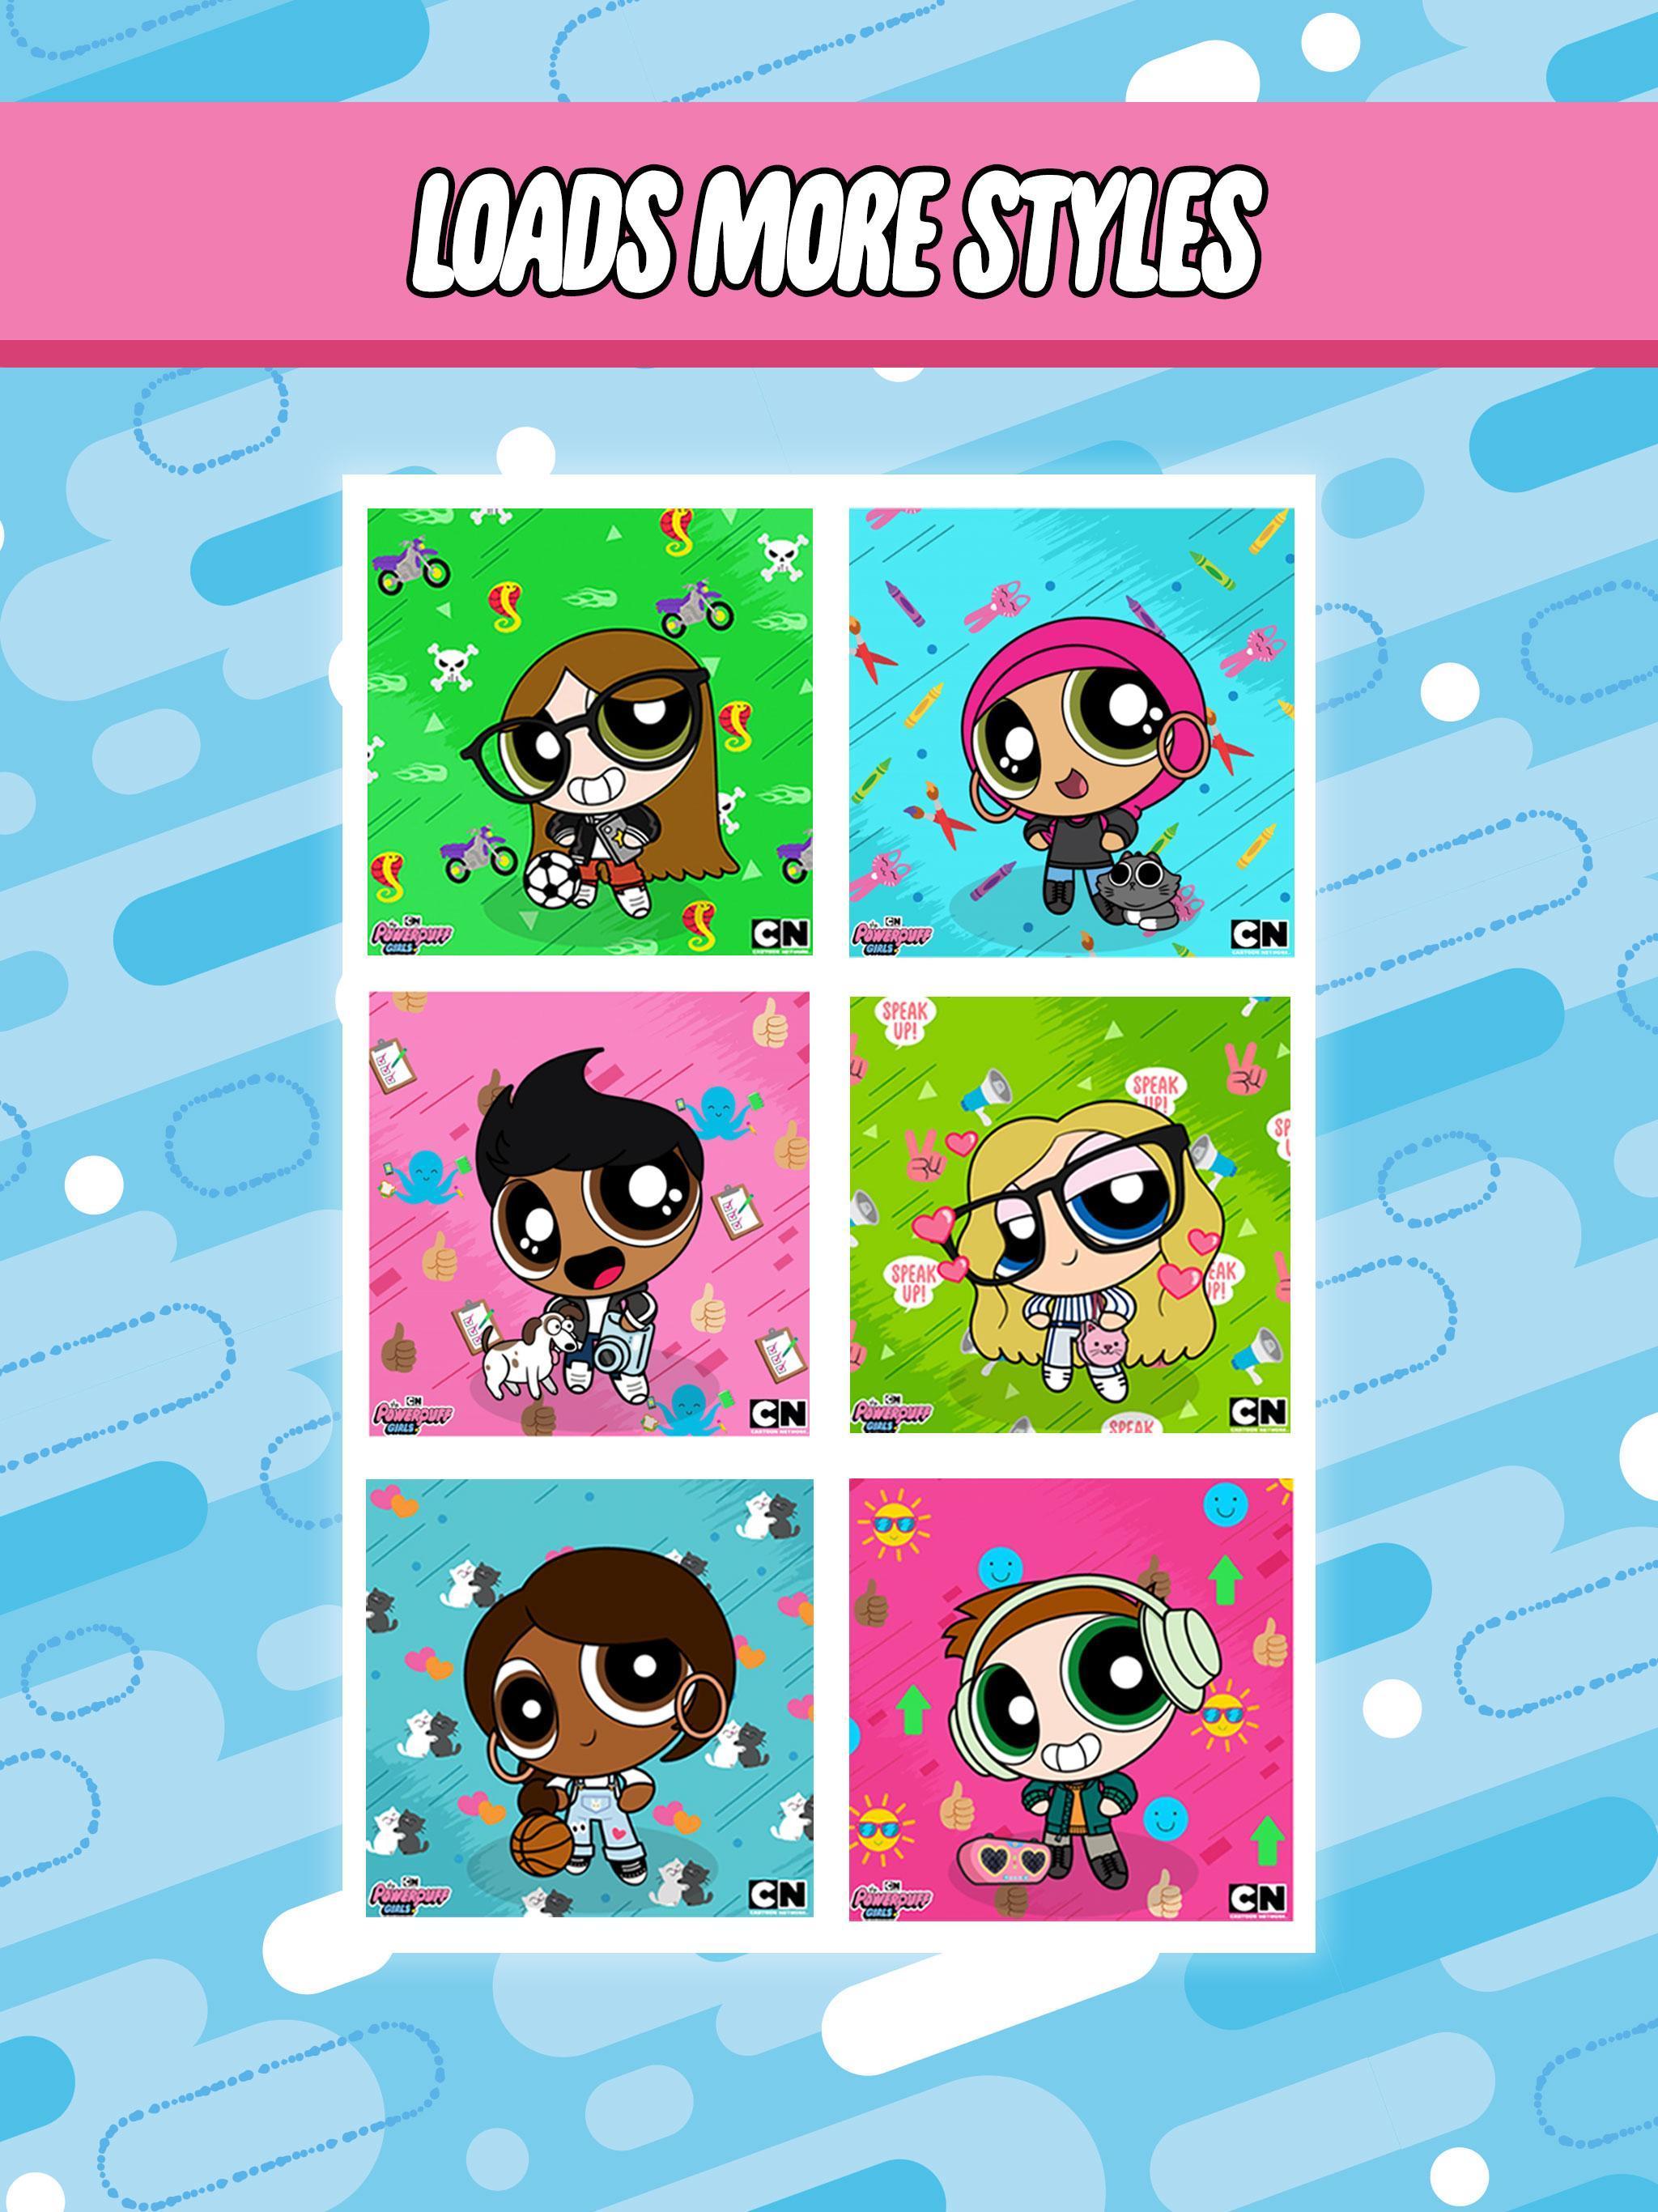 Powerpuff Yourself Powerpuff Girls Avatar Maker 3.8.0 Screenshot 13